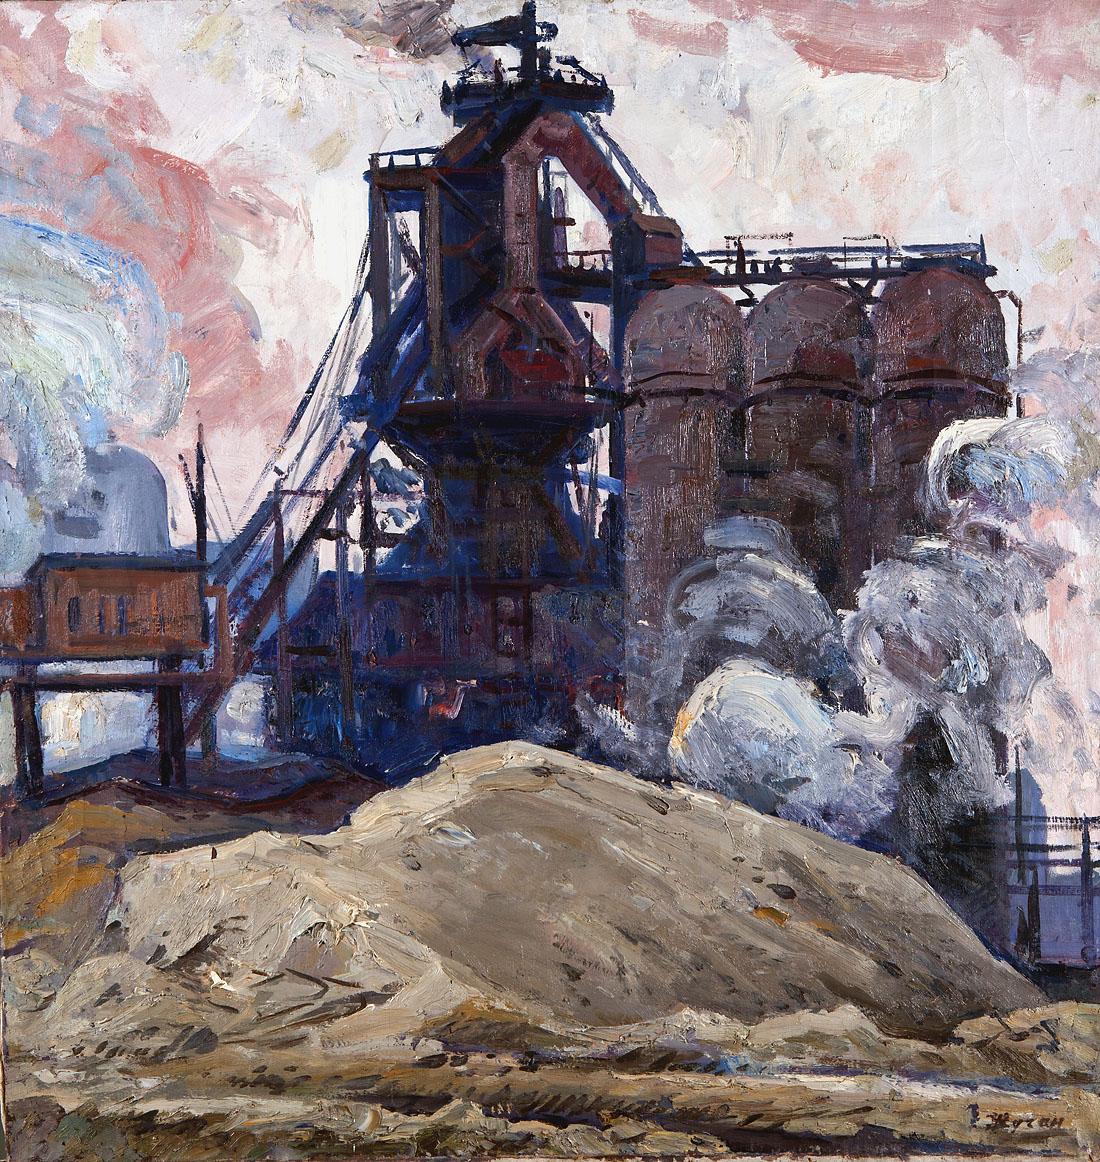 Blast furnace - Zhugan V.